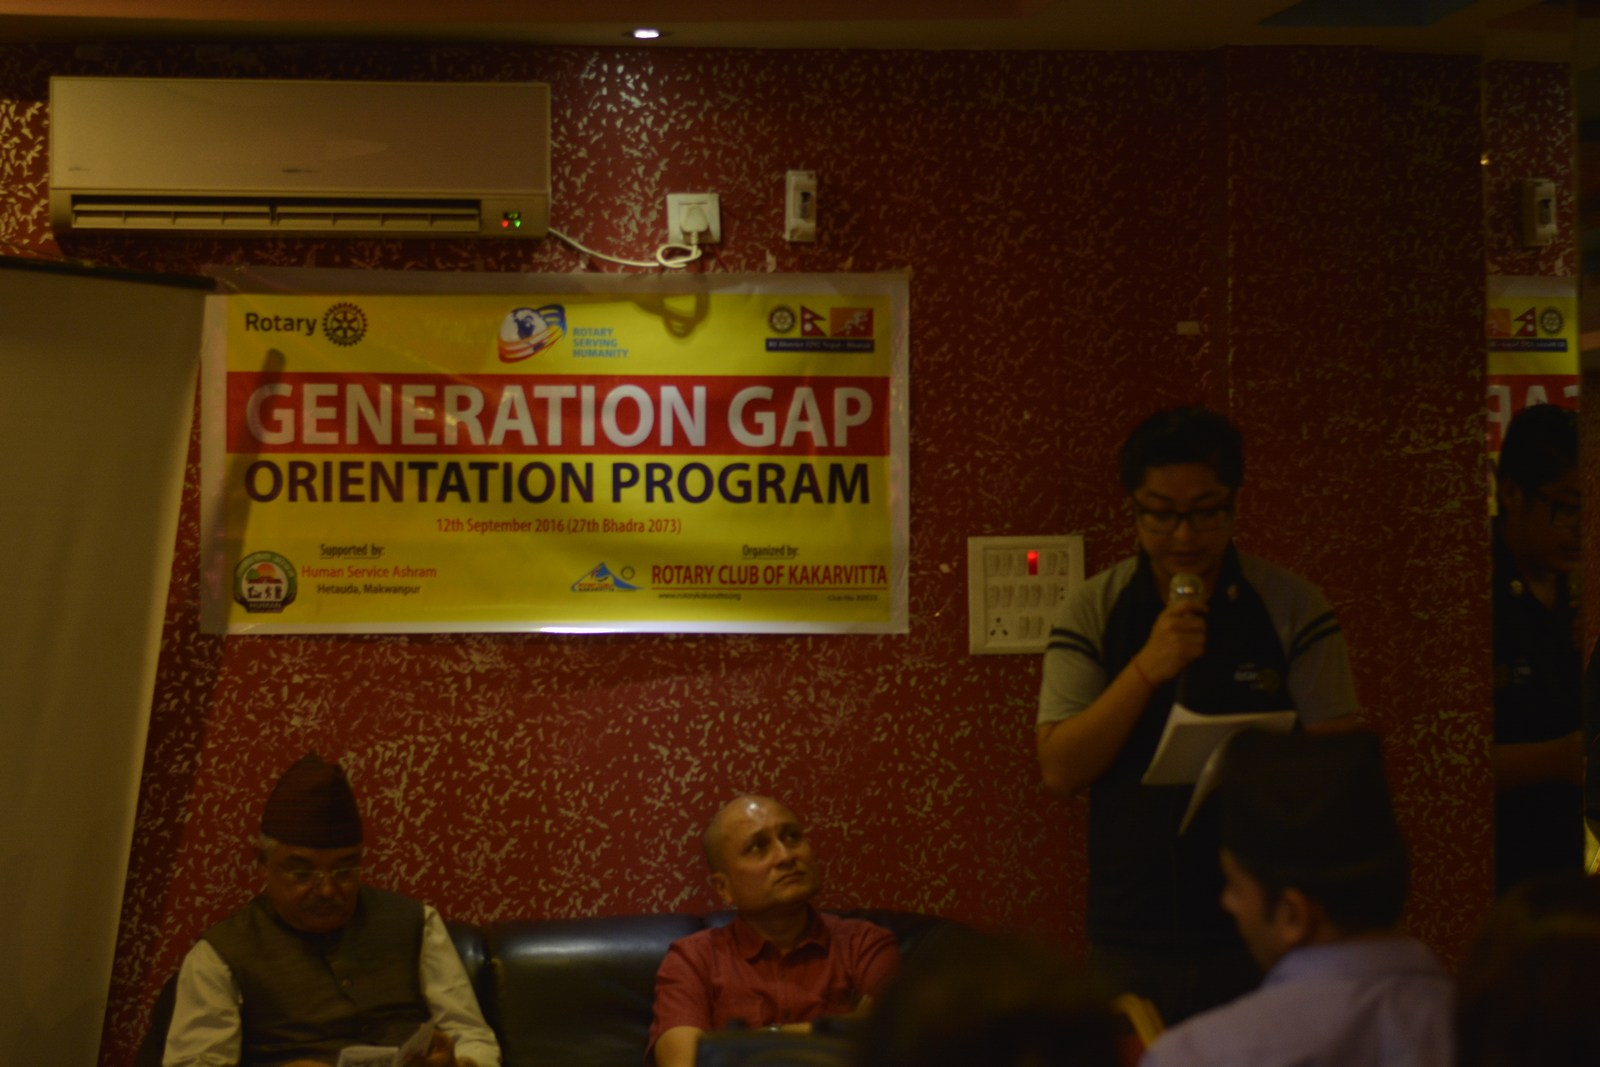 Generation-Gap-Orientation-Program-Rotary-Club-of-Kakarvitta-21